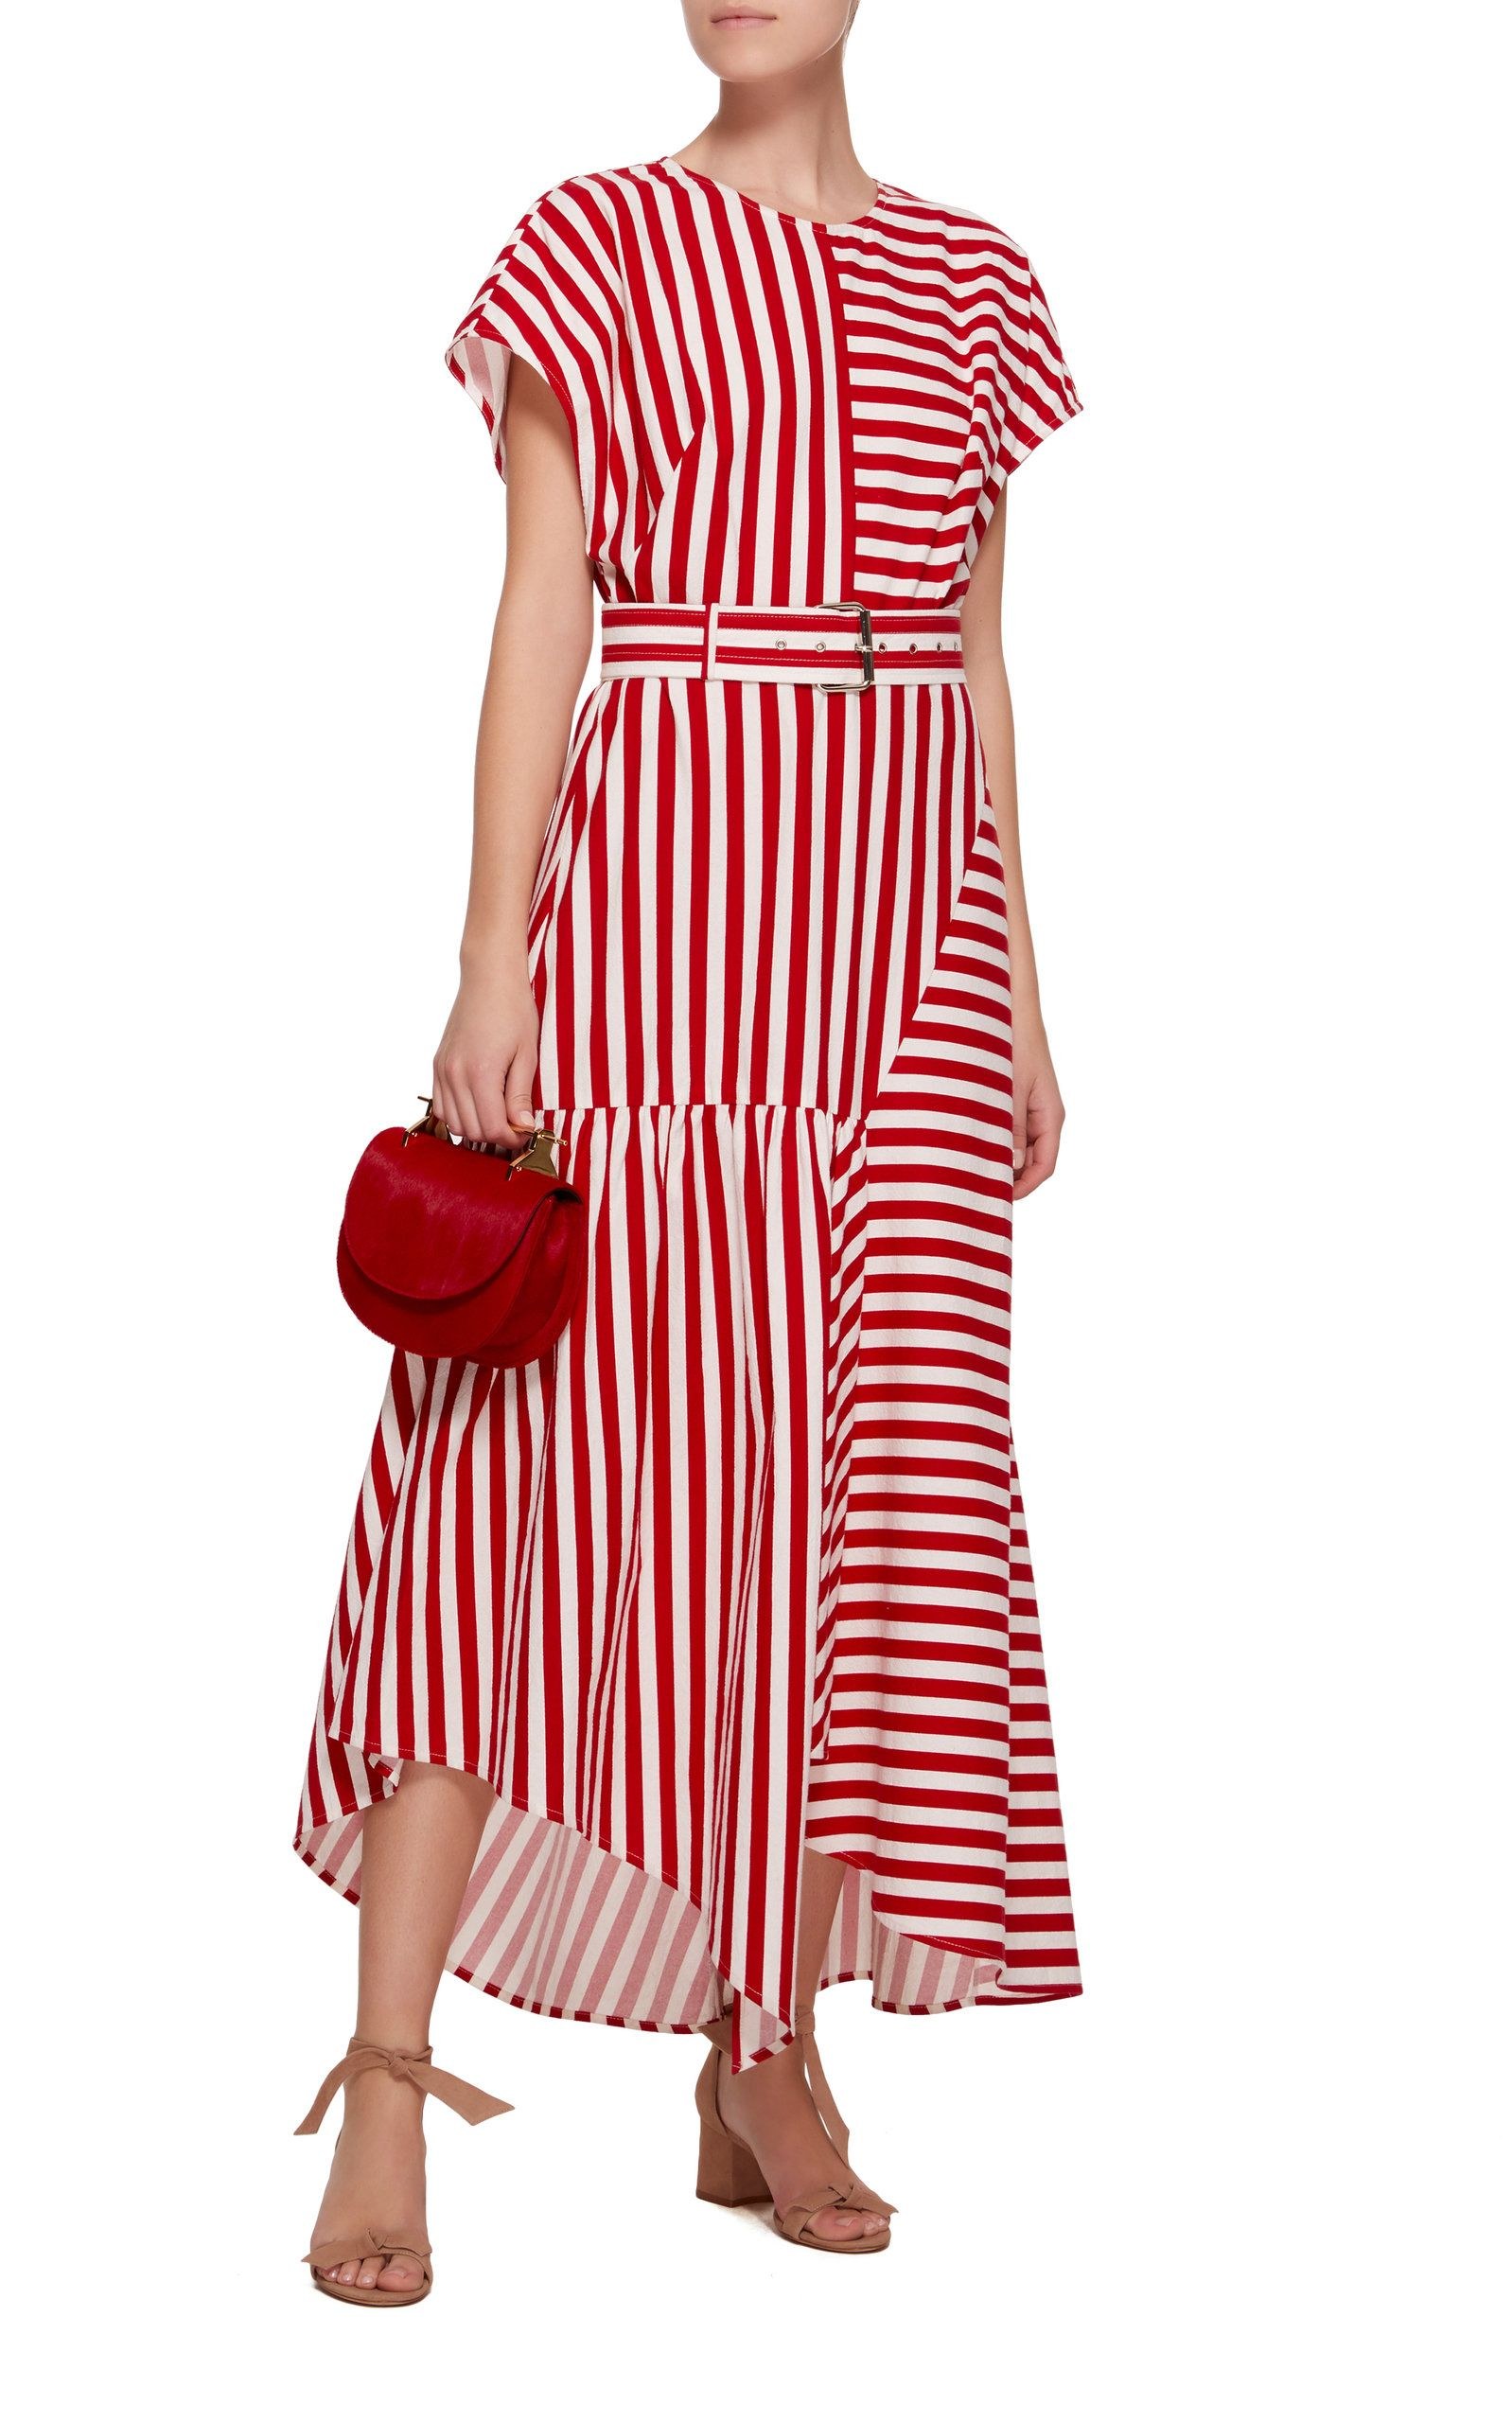 e6e59f50e Rachel Comey Steady Belted Asymmetric Cotton Dress